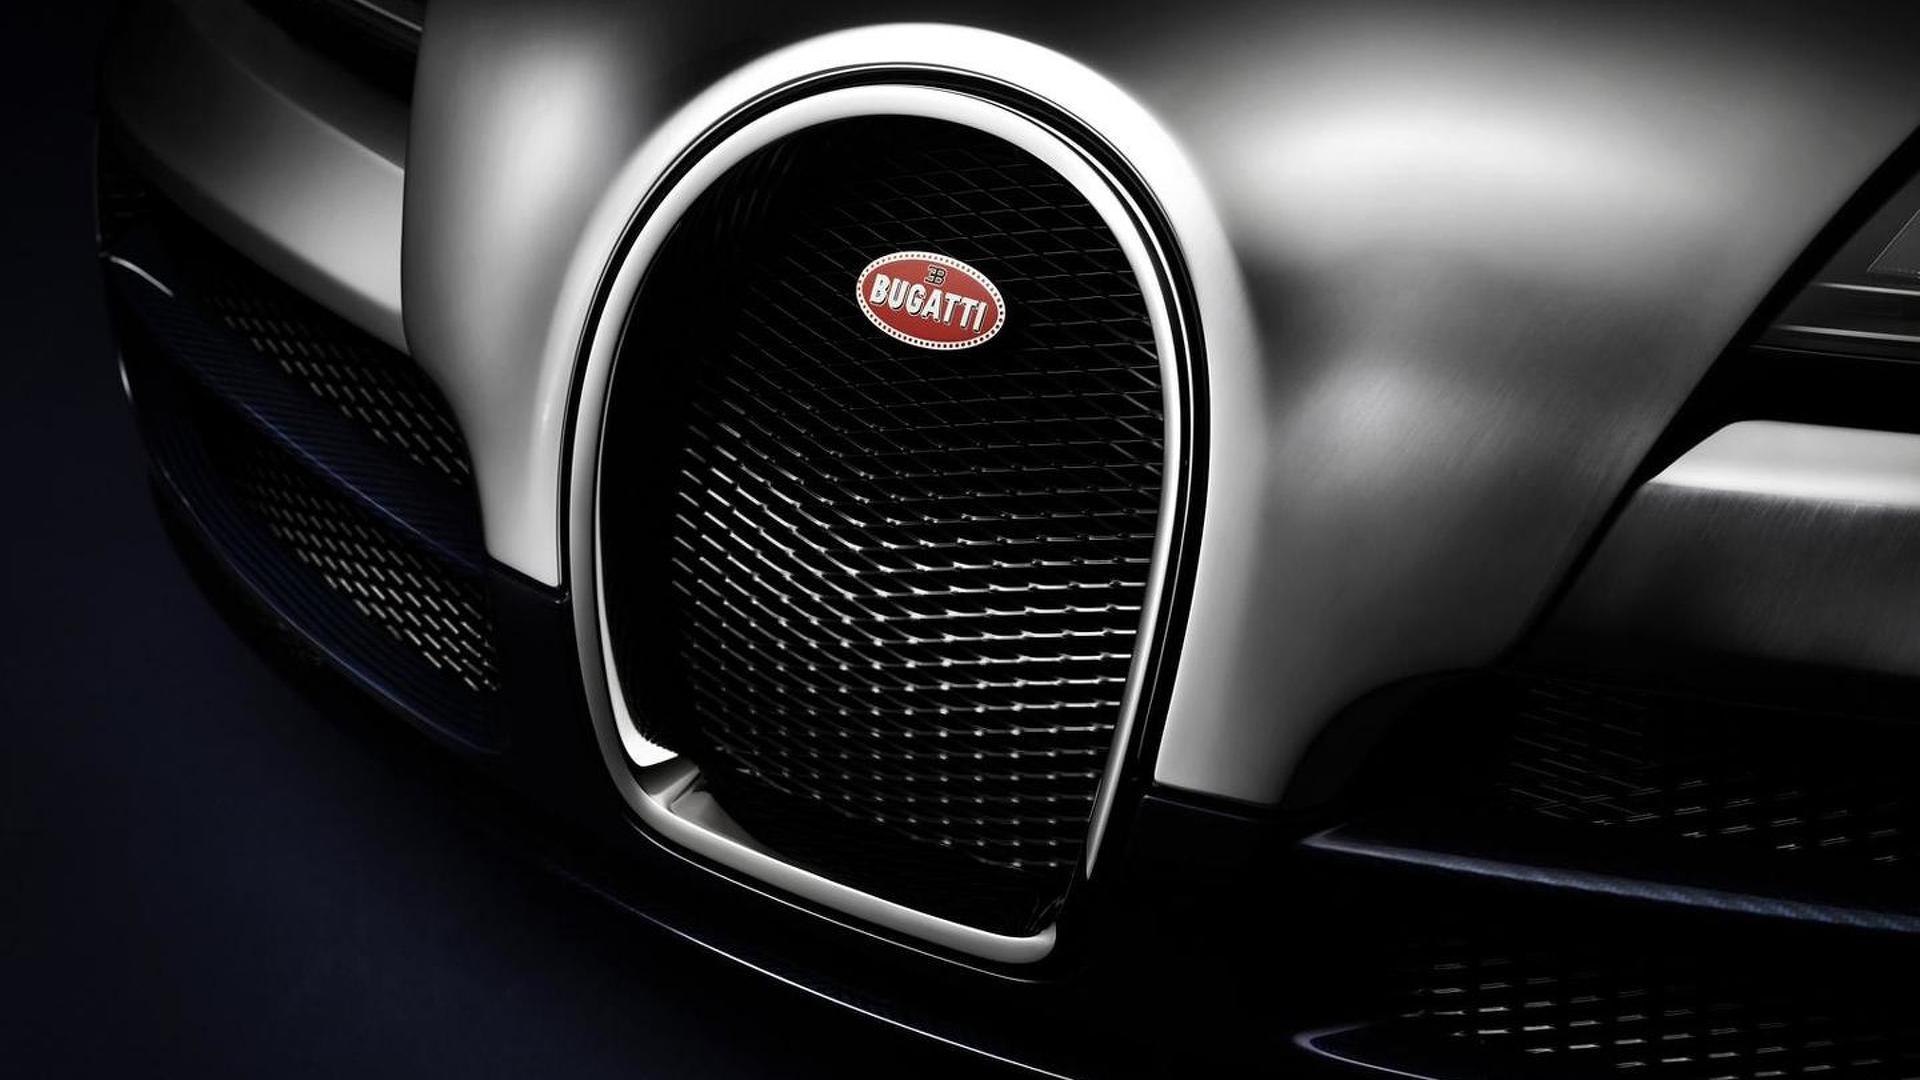 Радиаторная решетка Bugatti Veyron Ettore Bugatti Edition